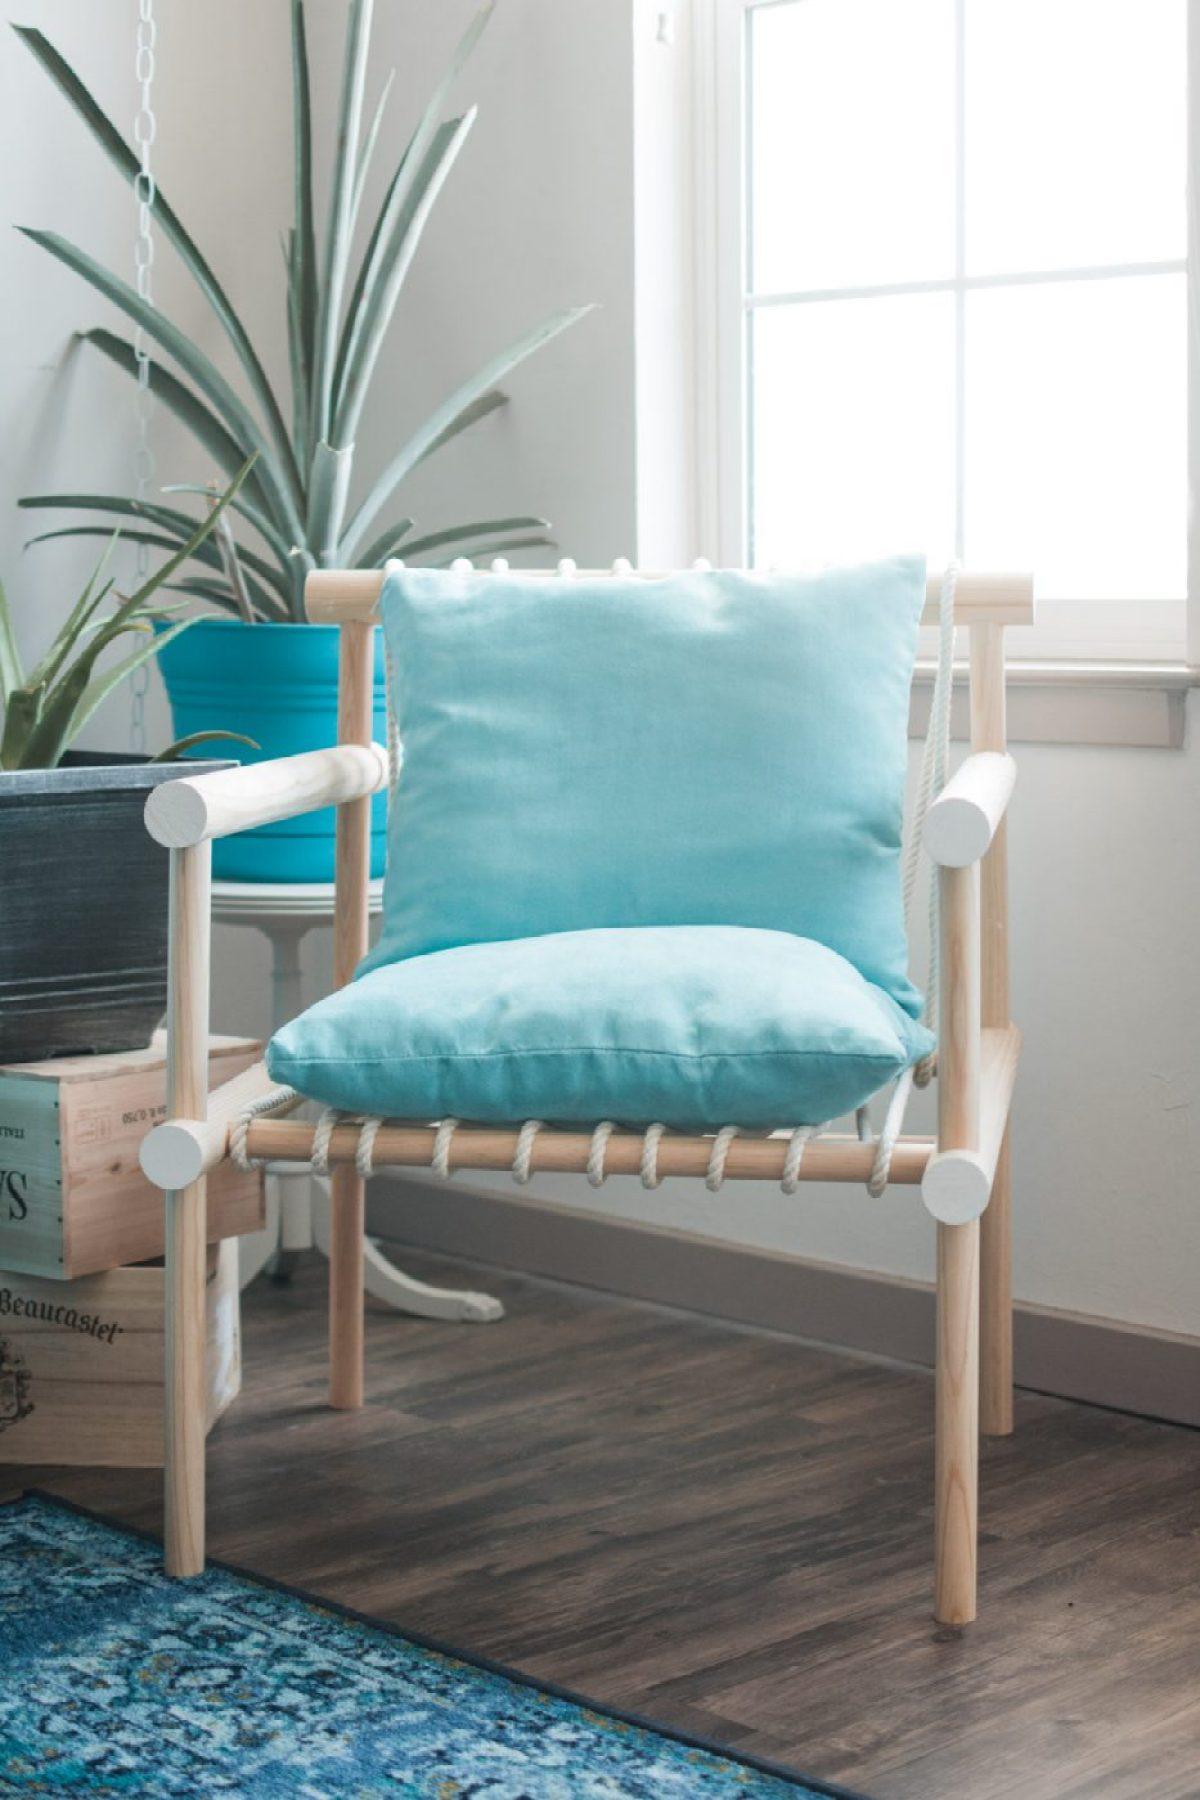 Boho Tropical Living Room Rope & Wooden Dowel Chair - Sweet Teal